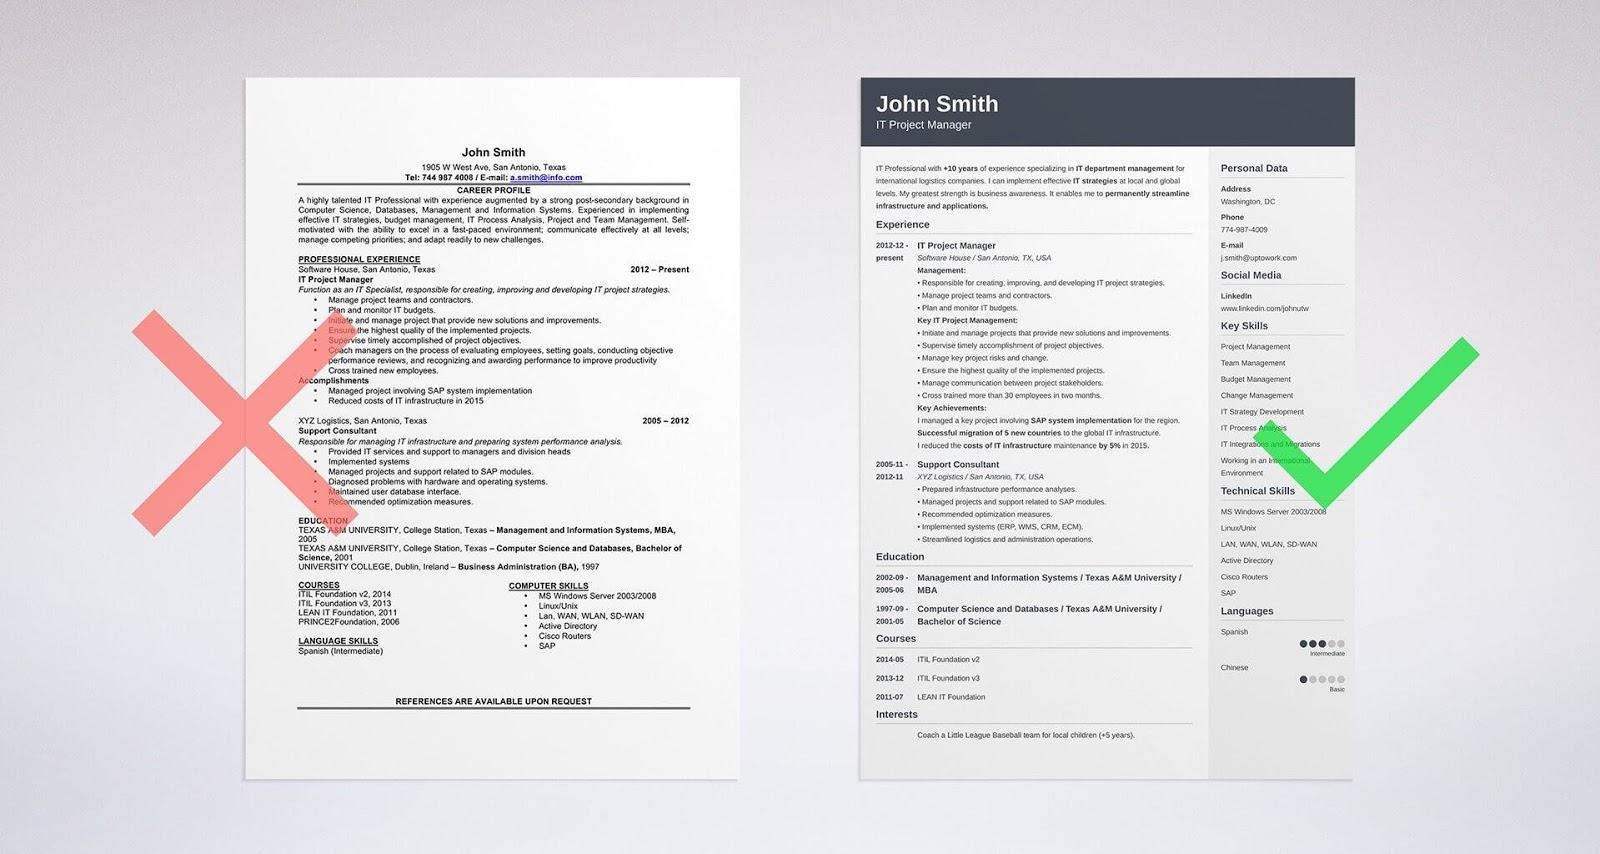 objective for resume objective for resume example 2019 objective for resume samples 2020 objective for resume for fresher objective for resume teacher objective for resume for students objective for resume nursing objective for resume retail